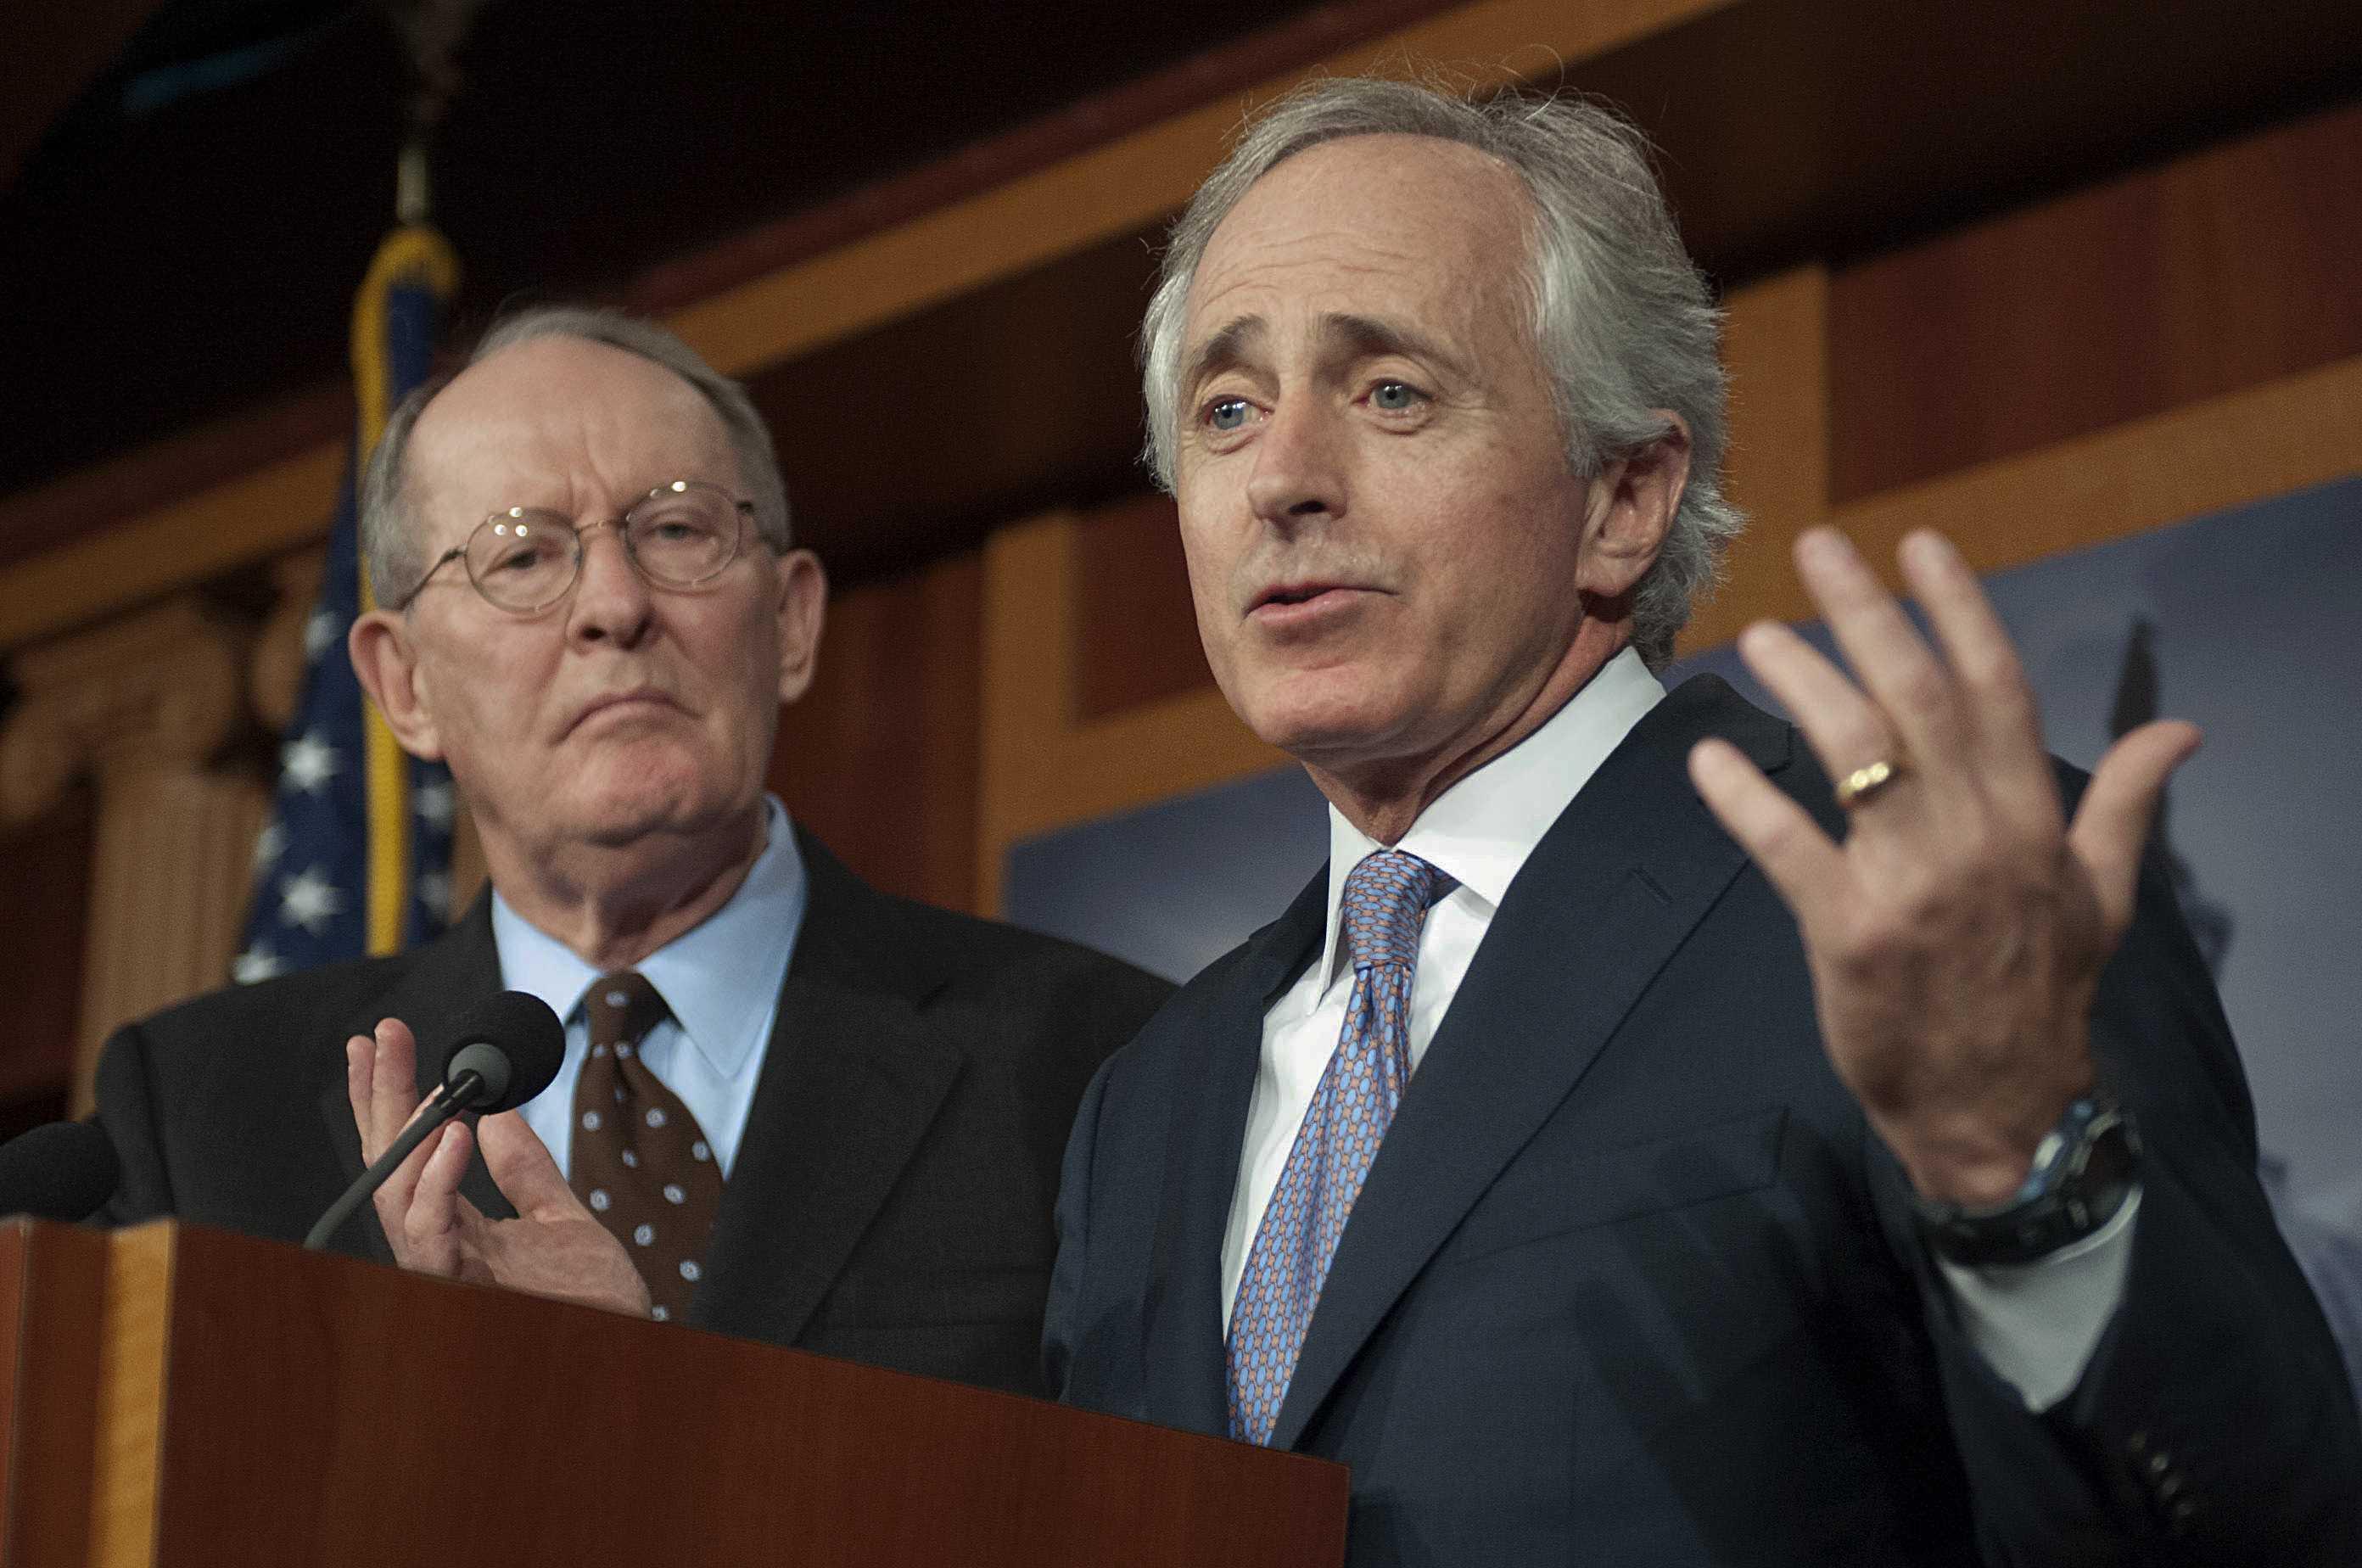 Insurance insiders still hopeful that Congress will pass Medicare bills